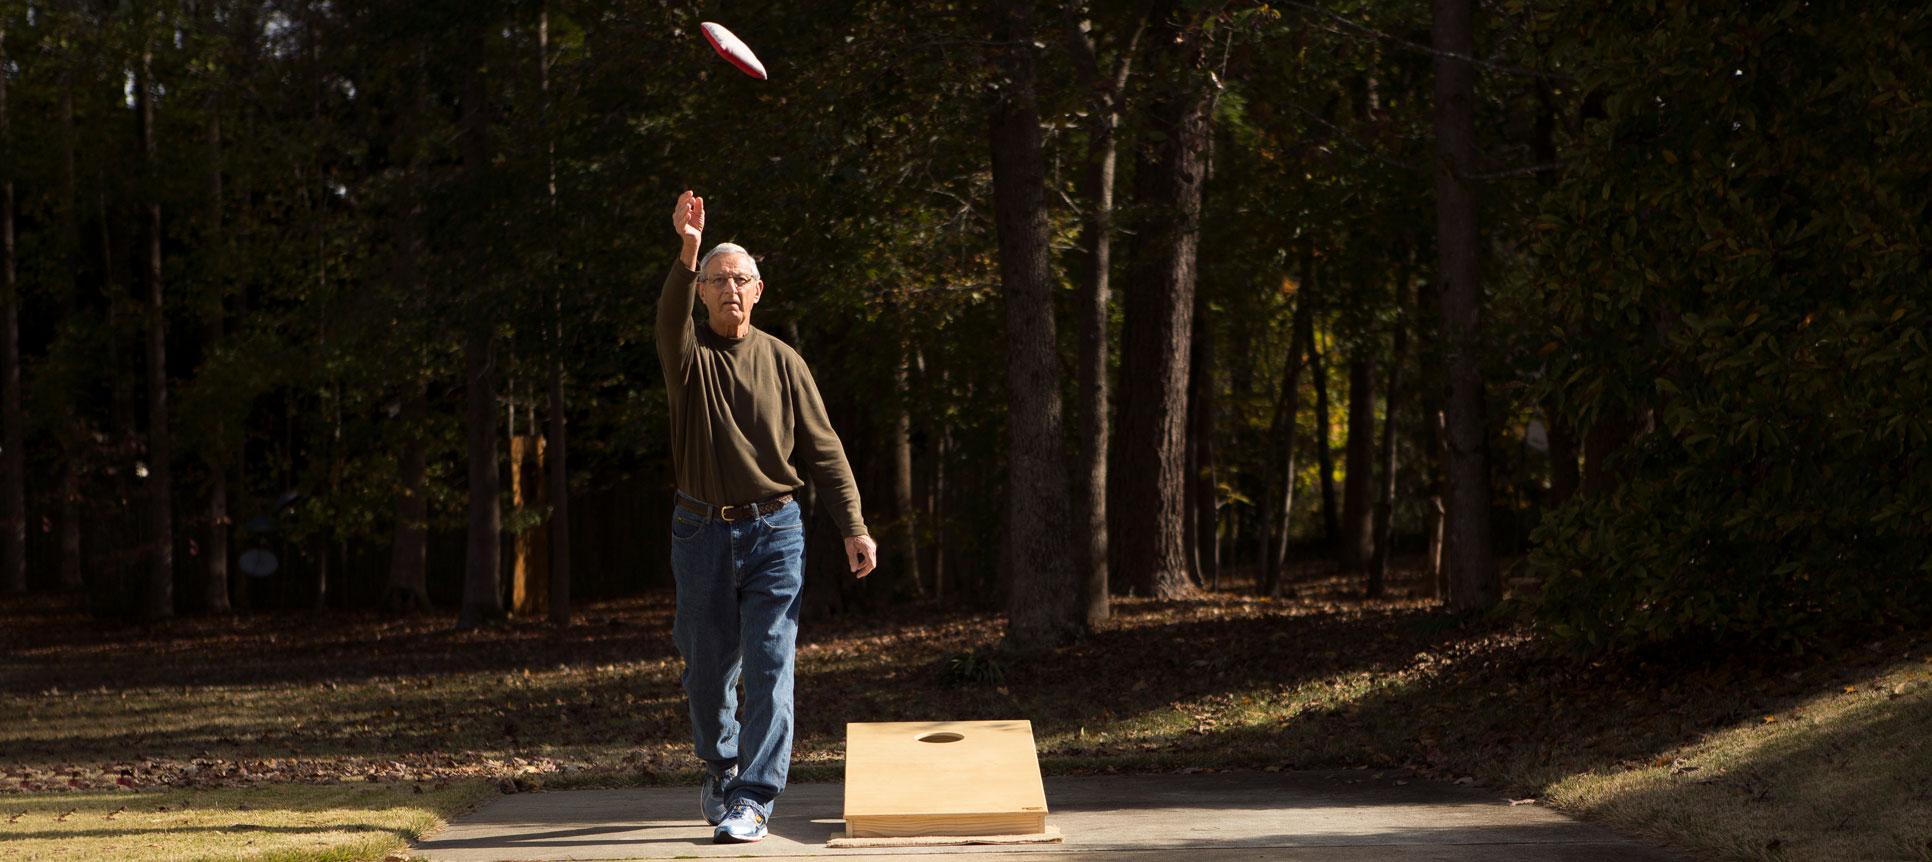 Dick Mazur tosses a cornhole bag.